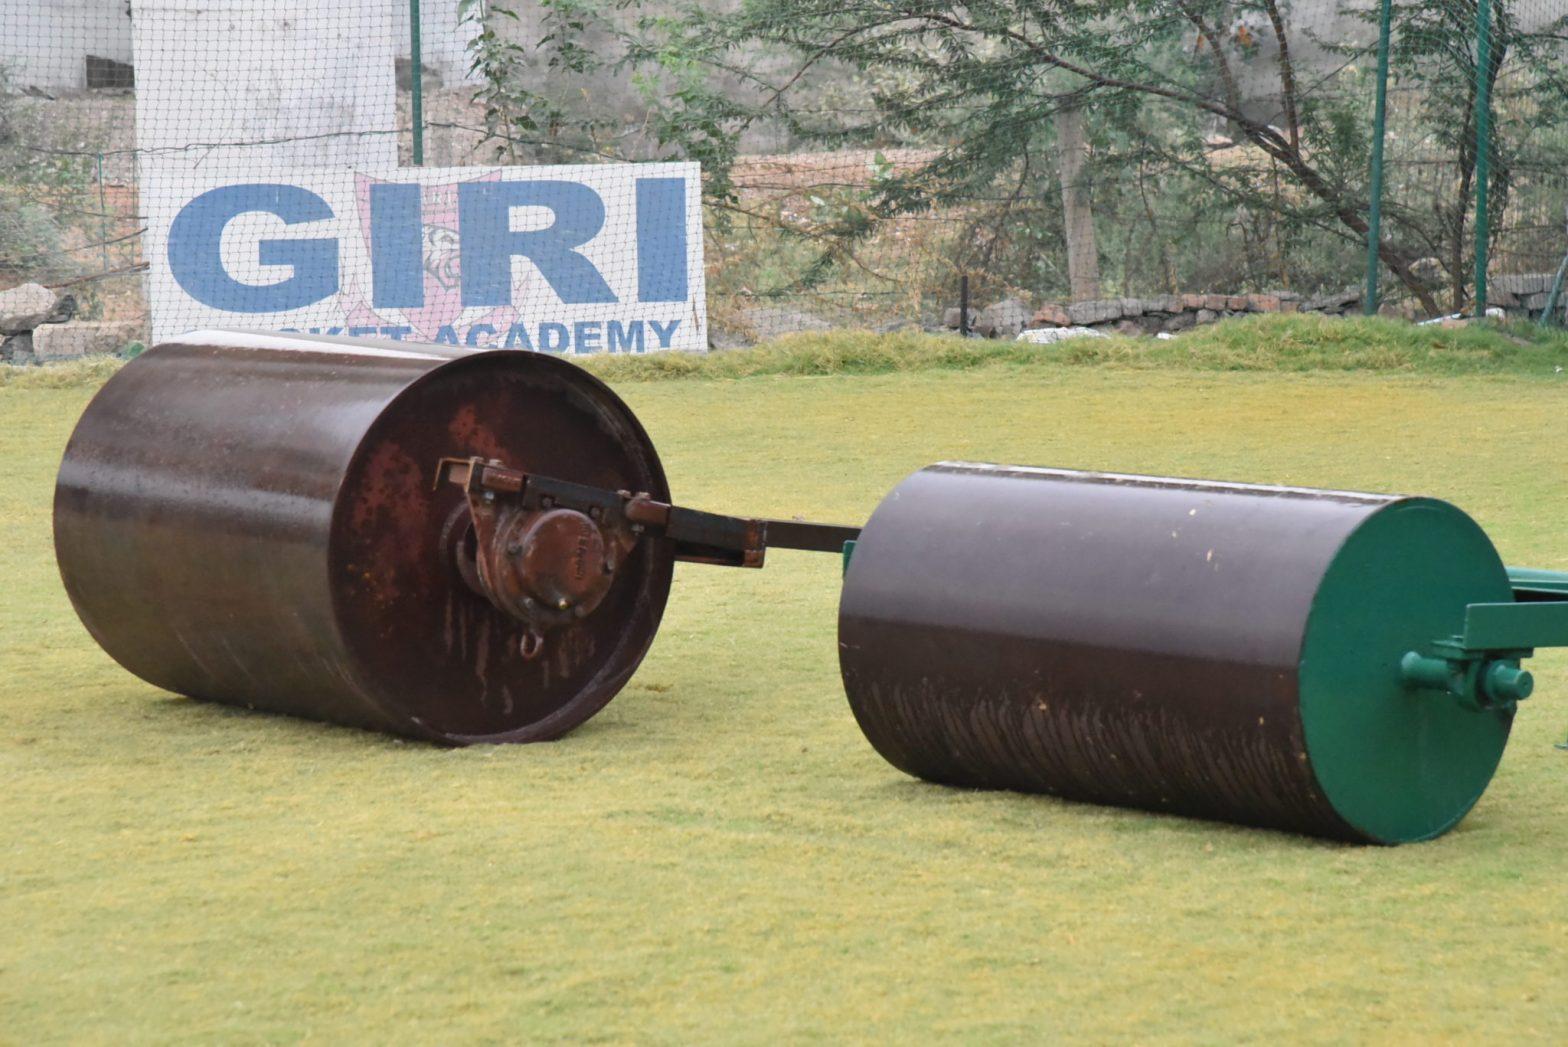 giri cricket academy-Cricket Academy